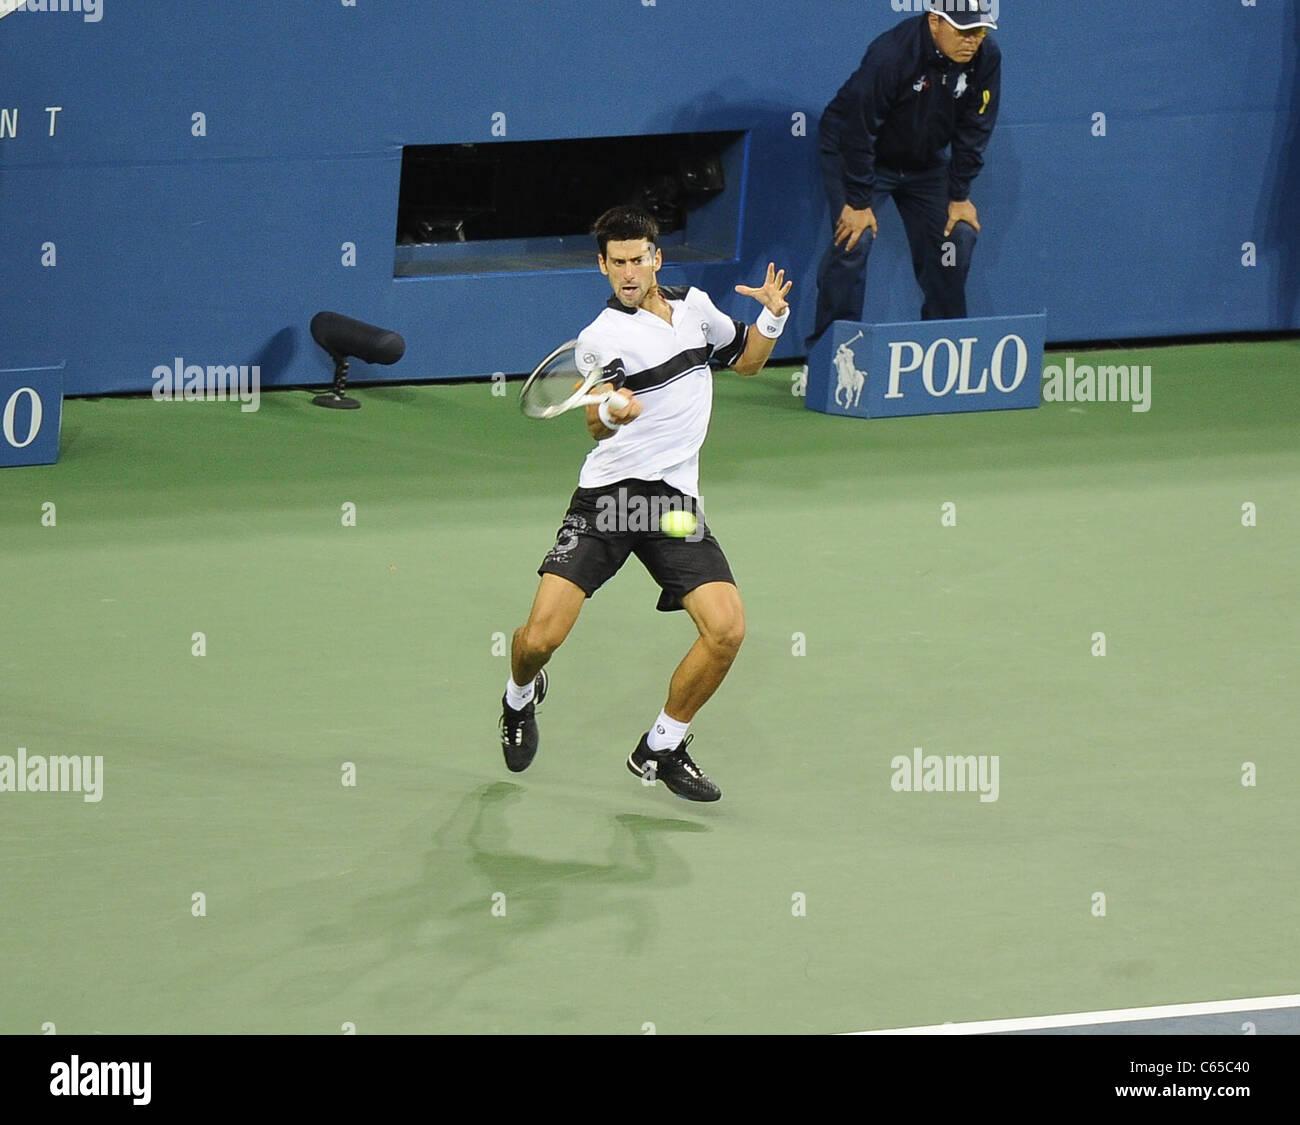 Novak Djokovic in attendance for US Open 2010 Tennis Tournament Men's Singles Finals Match, Arthur Ashe Stadium, - Stock Image